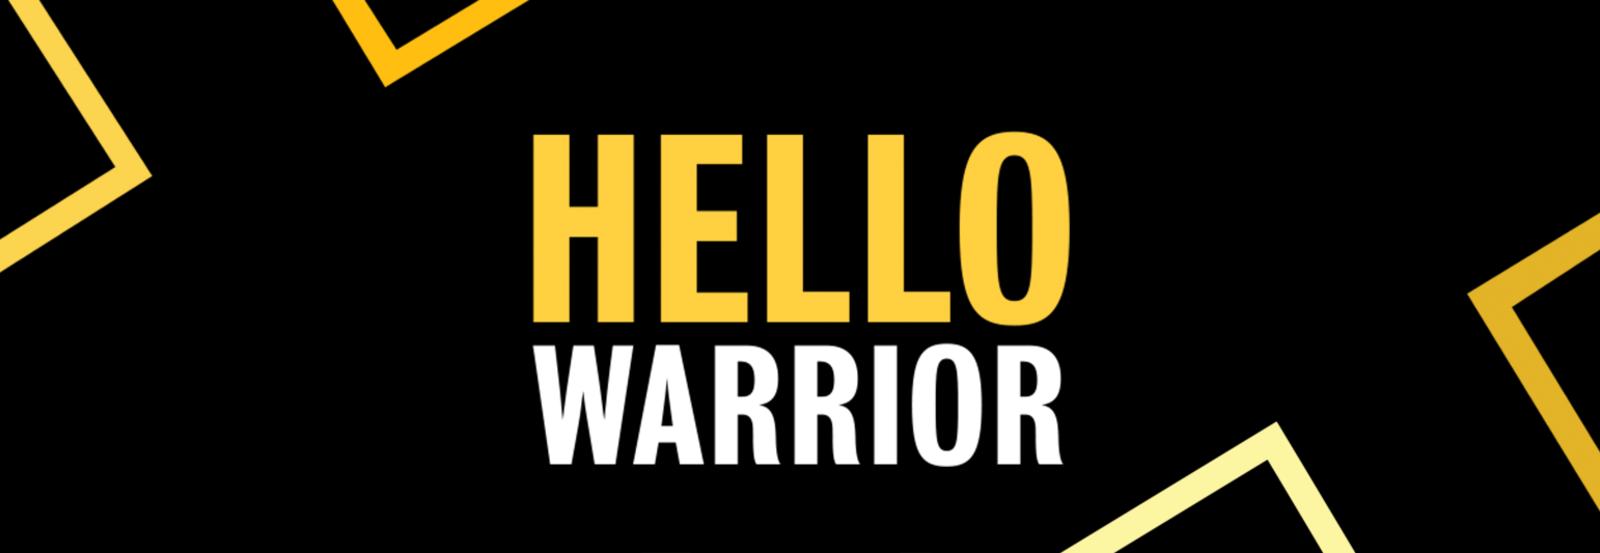 Hello Warrior